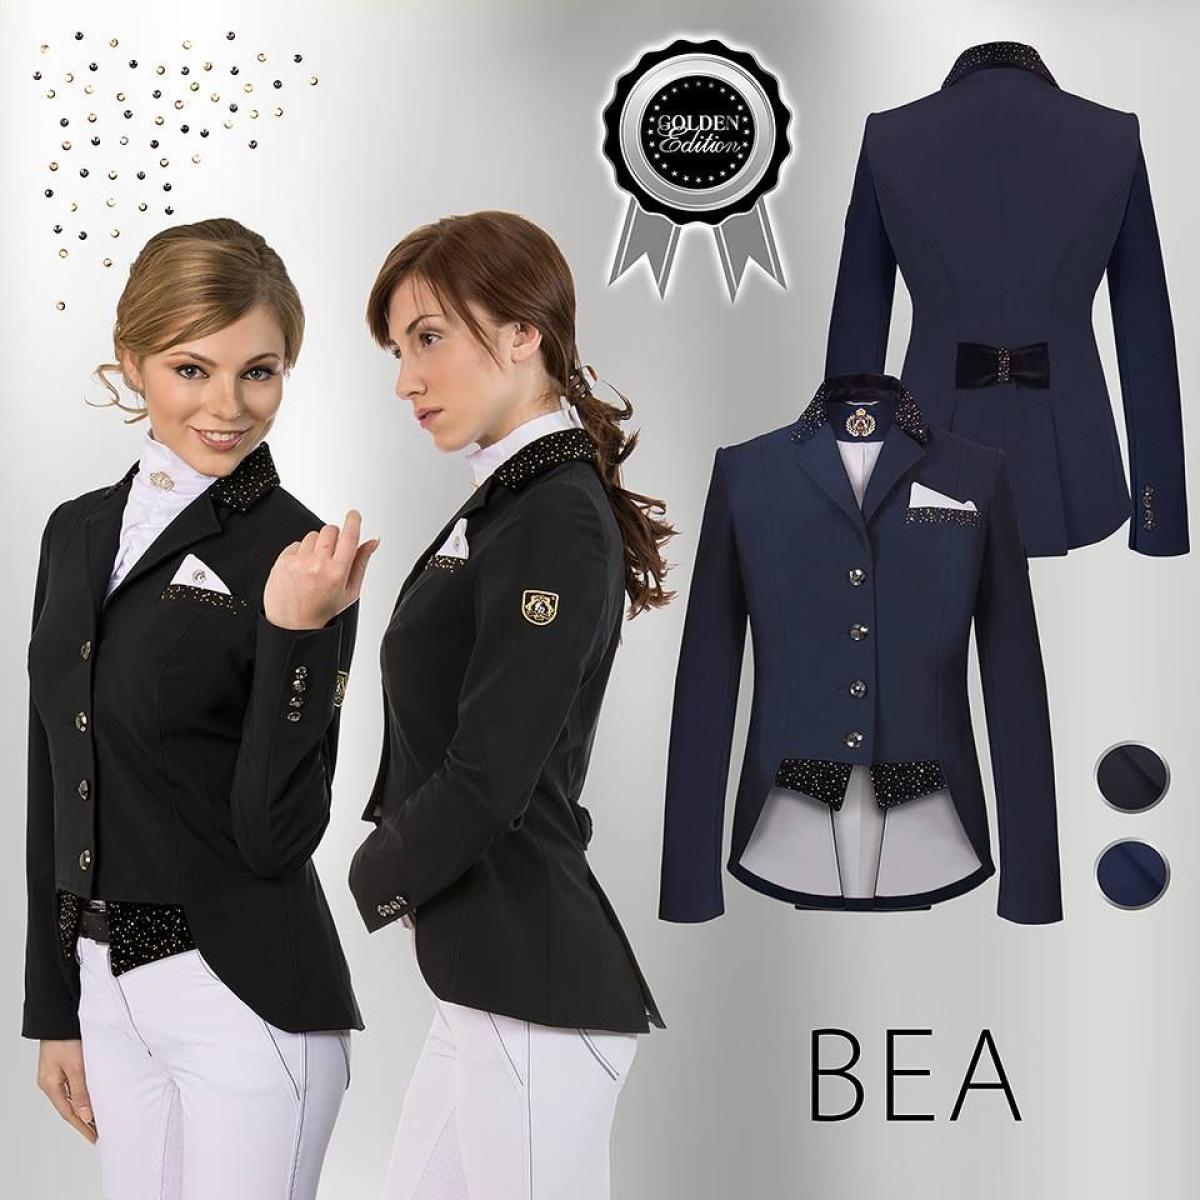 FP Bea Dressur jakke KS Hestesport